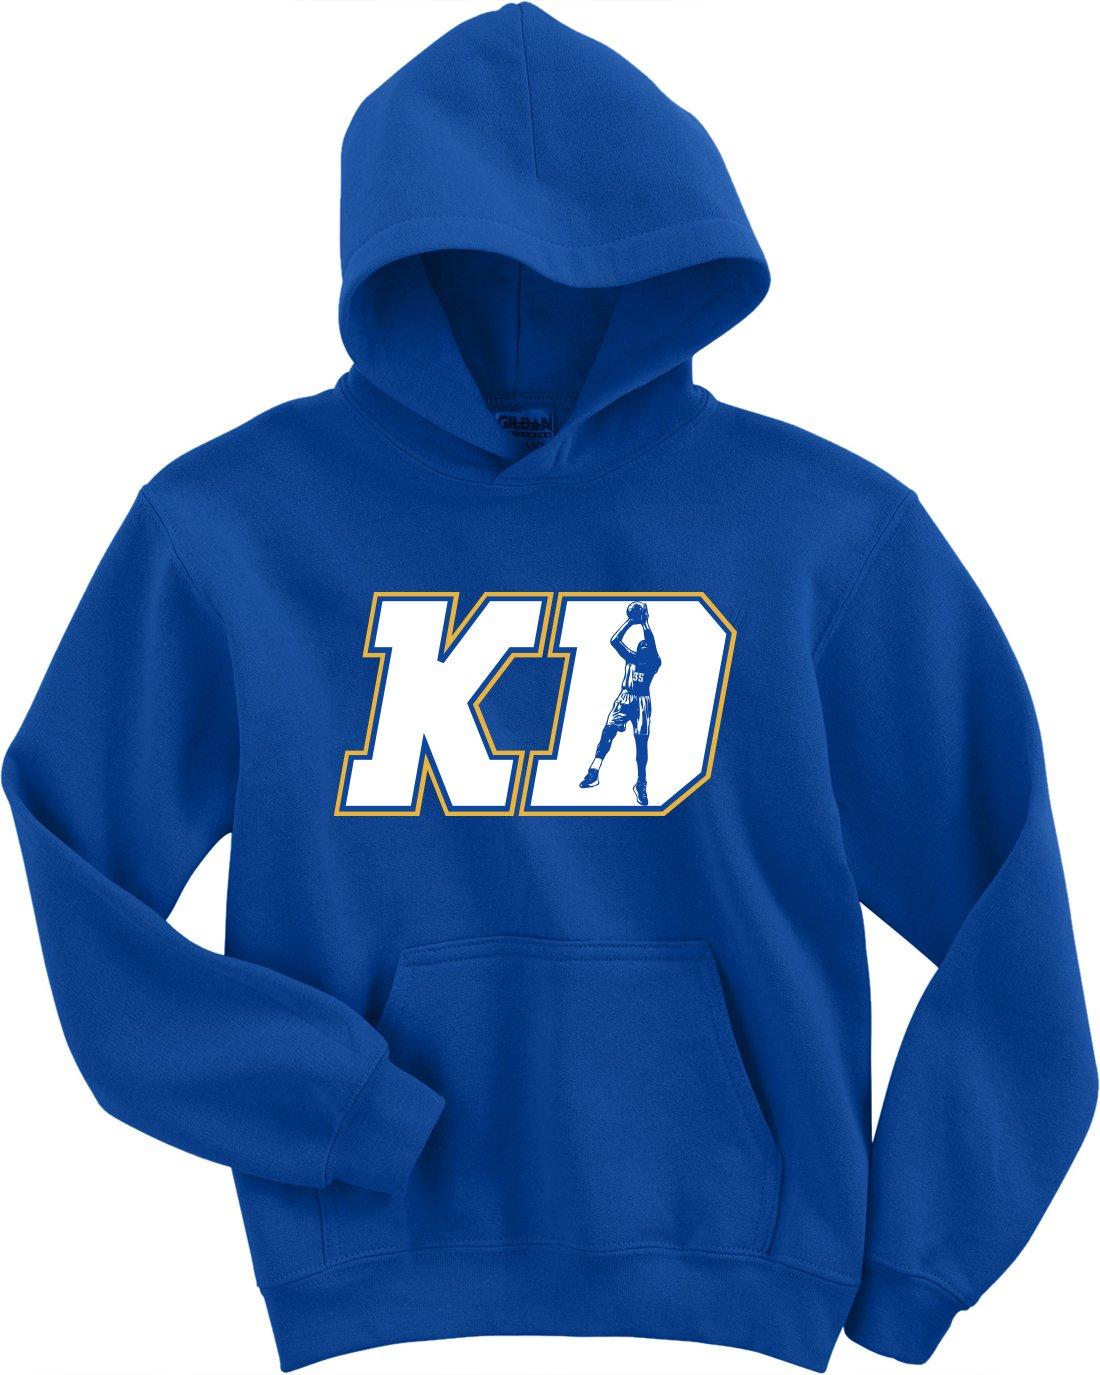 Royal Kd Durant Golden State Kd Logo Hooded 2236 Shirts